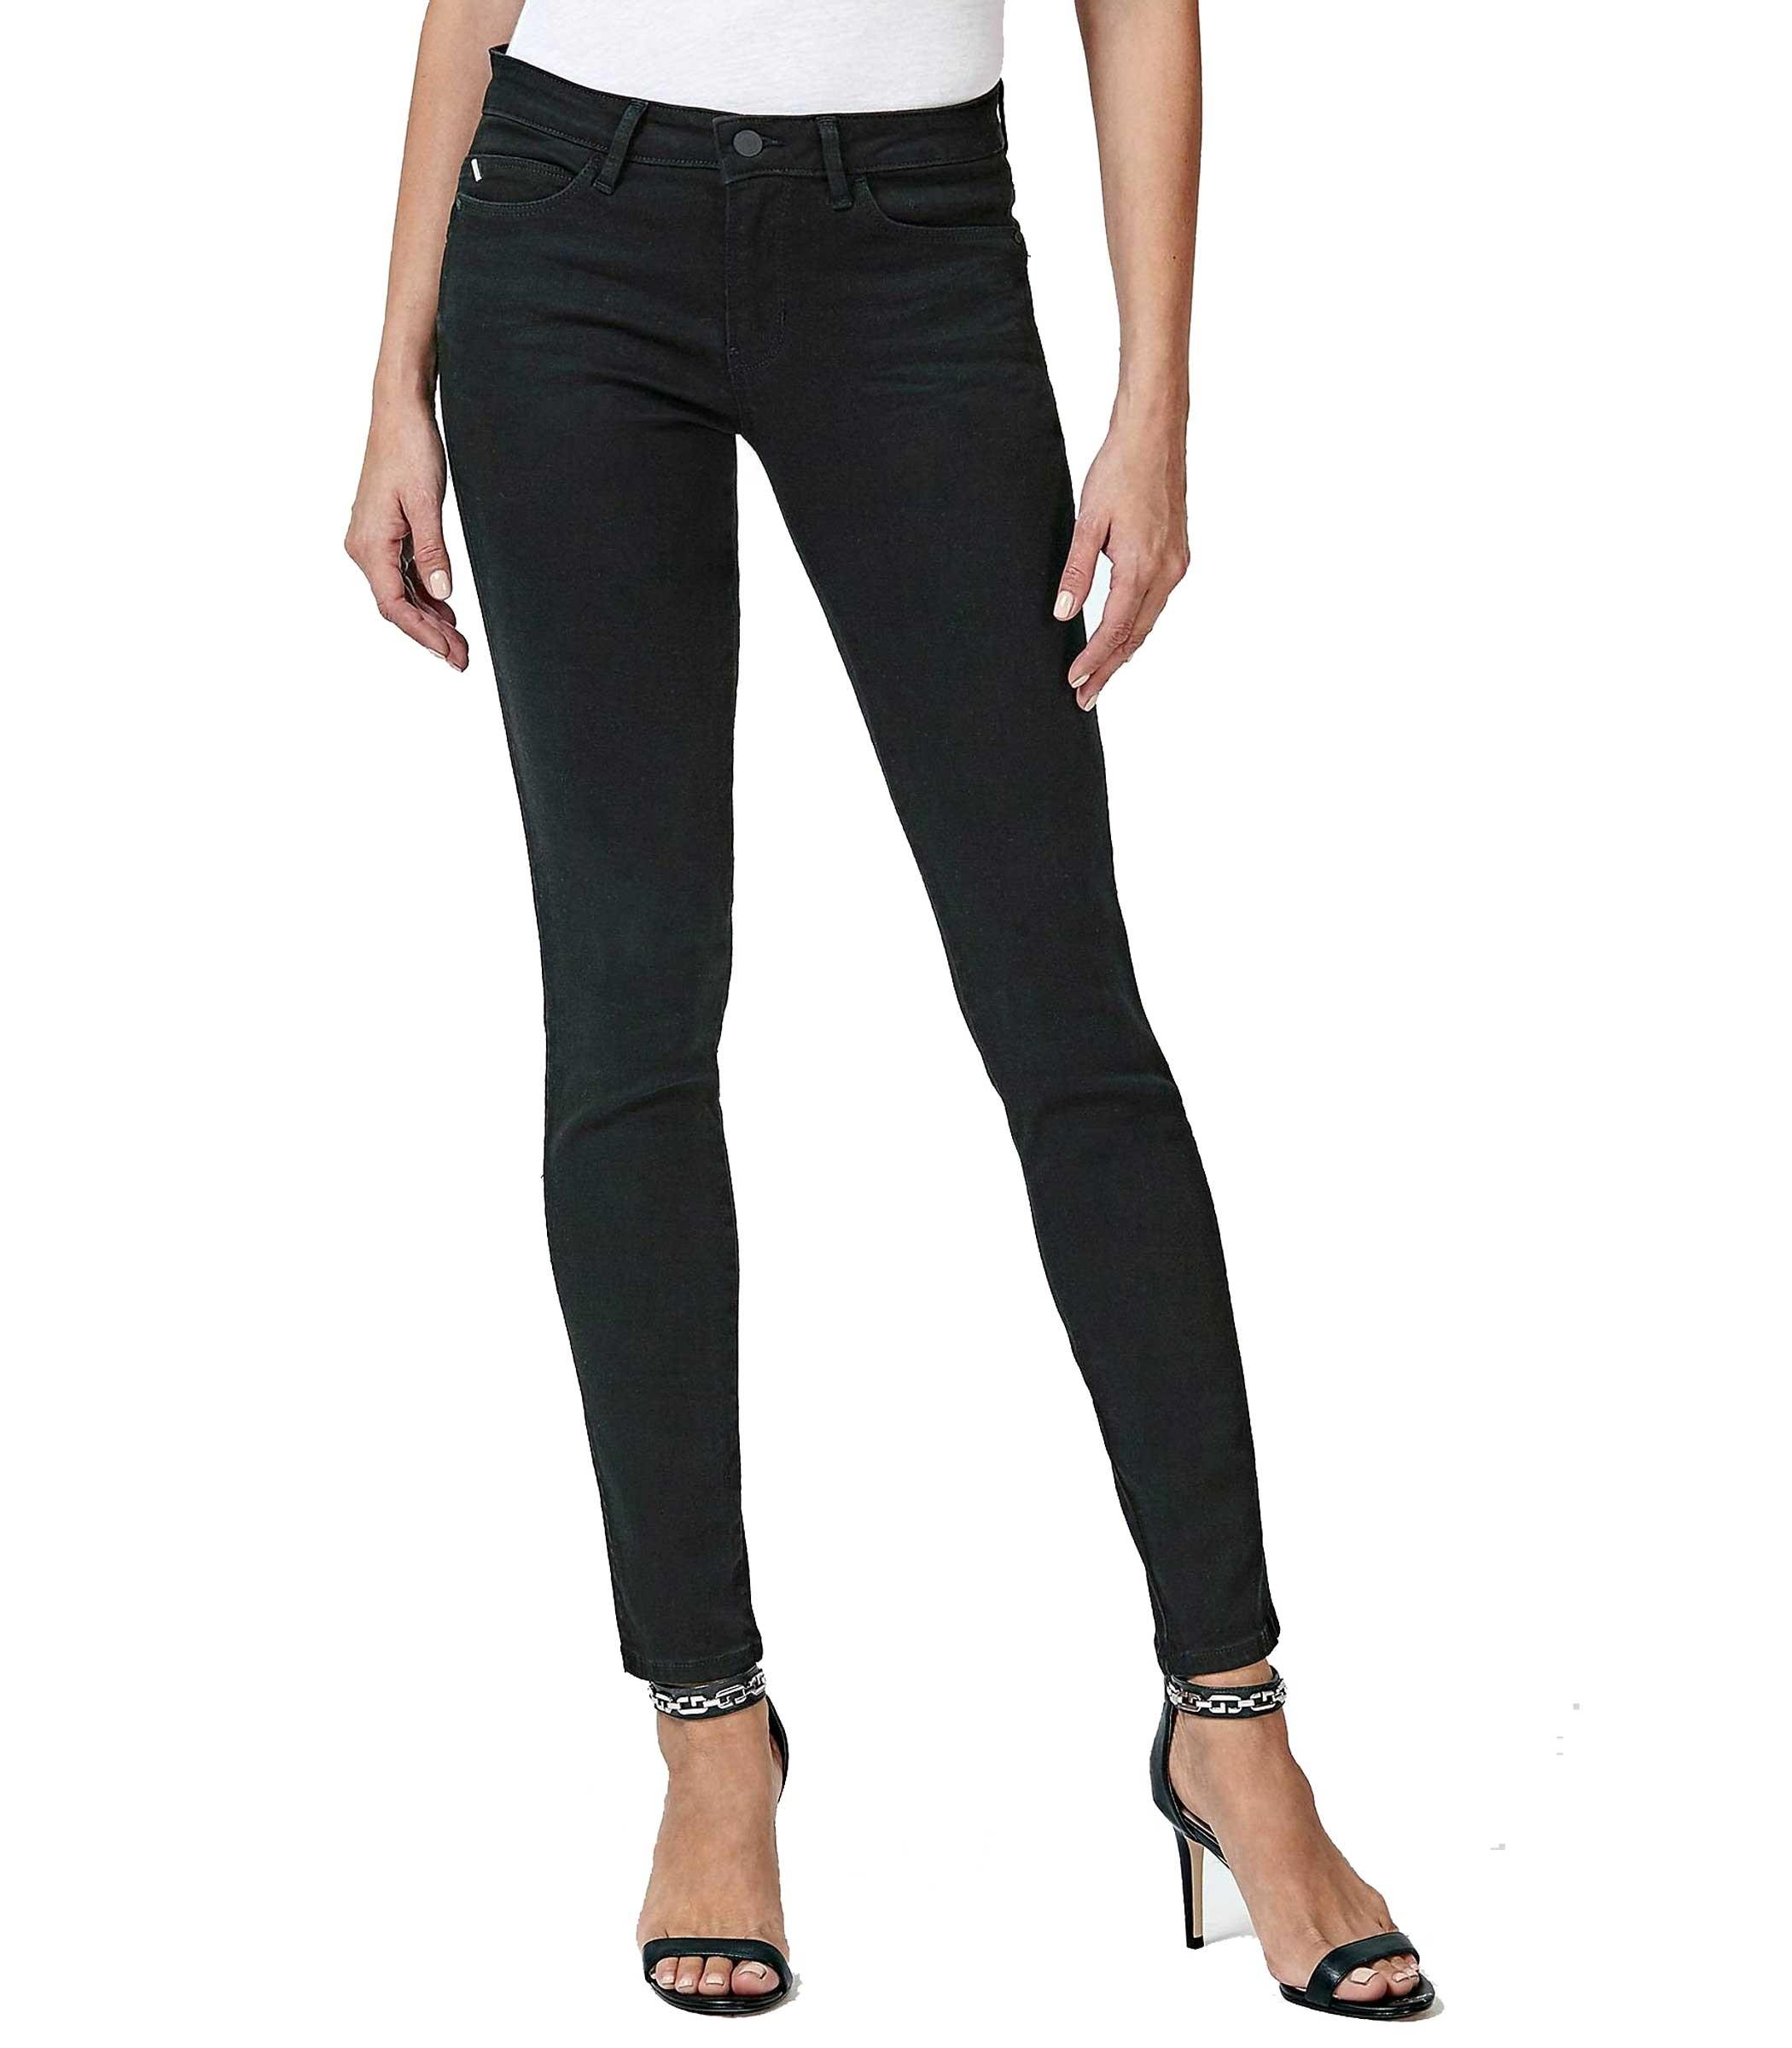 1f1b0e3ab47273 Jeans Guess skinny modello 5 tasche da donna rif. W83AJ2D38M0